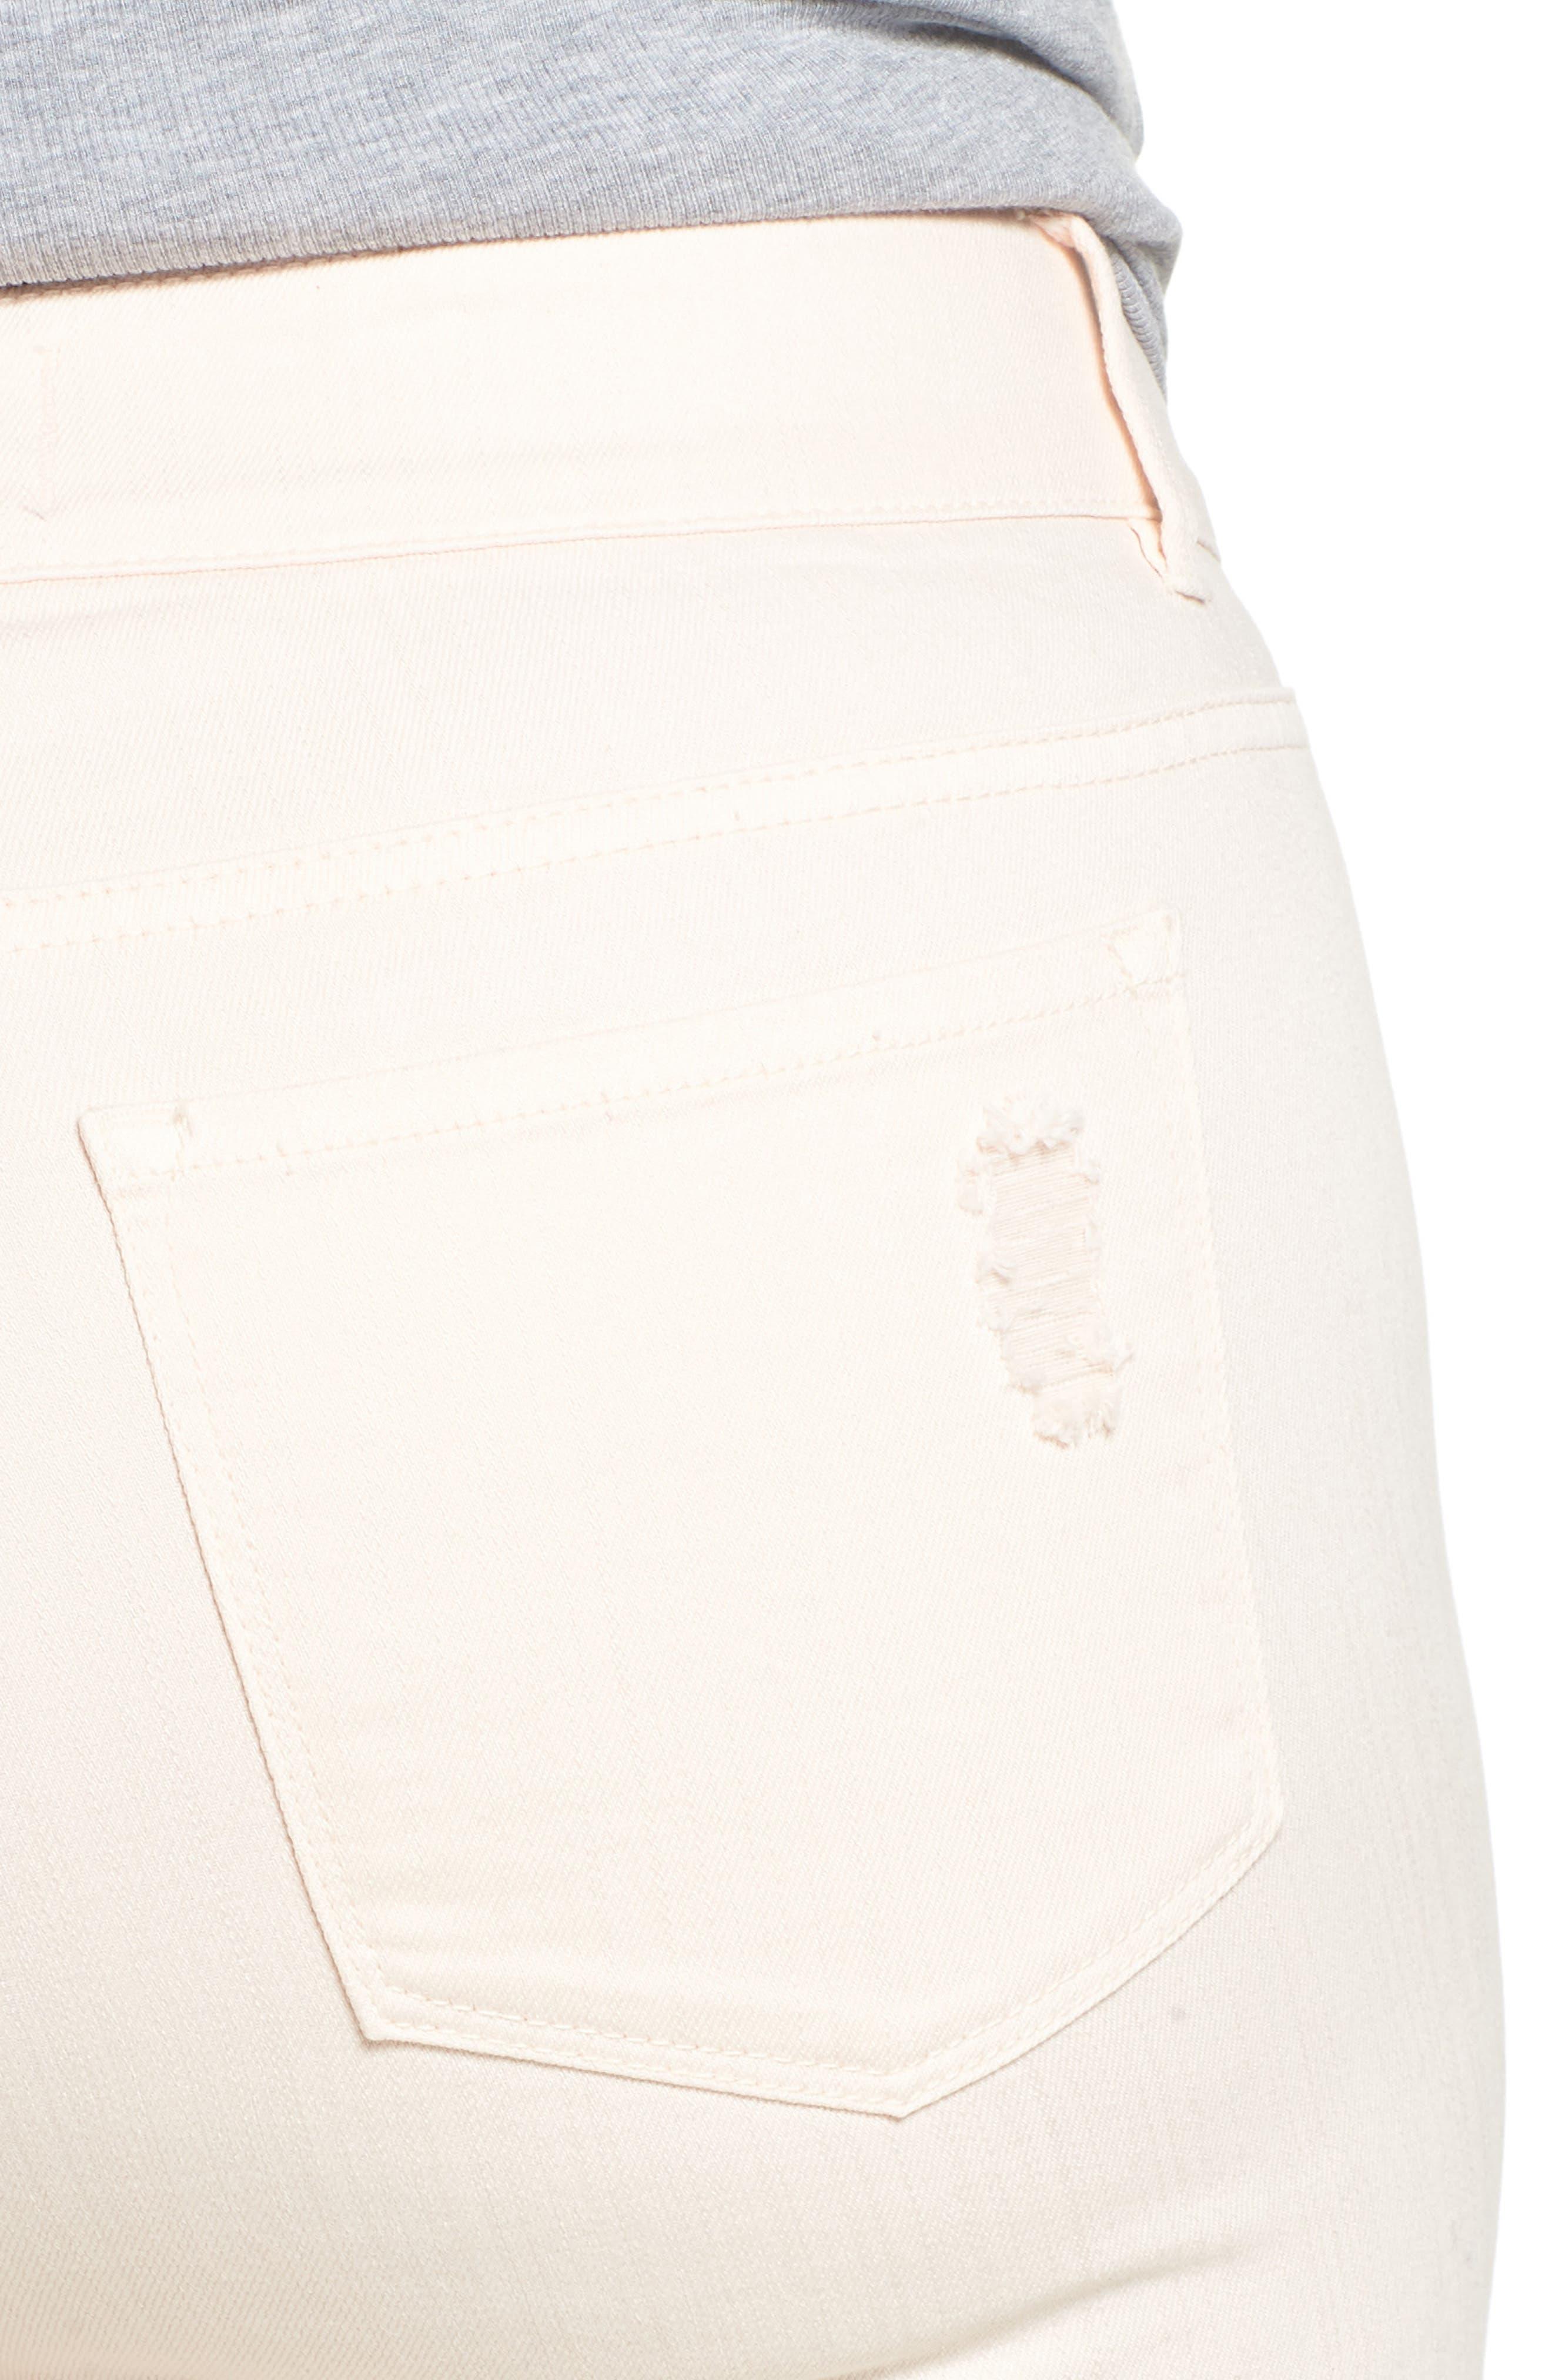 RACHEL RACHEL ROY,                             Icon Distressed Skinny Jeans,                             Alternate thumbnail 4, color,                             680